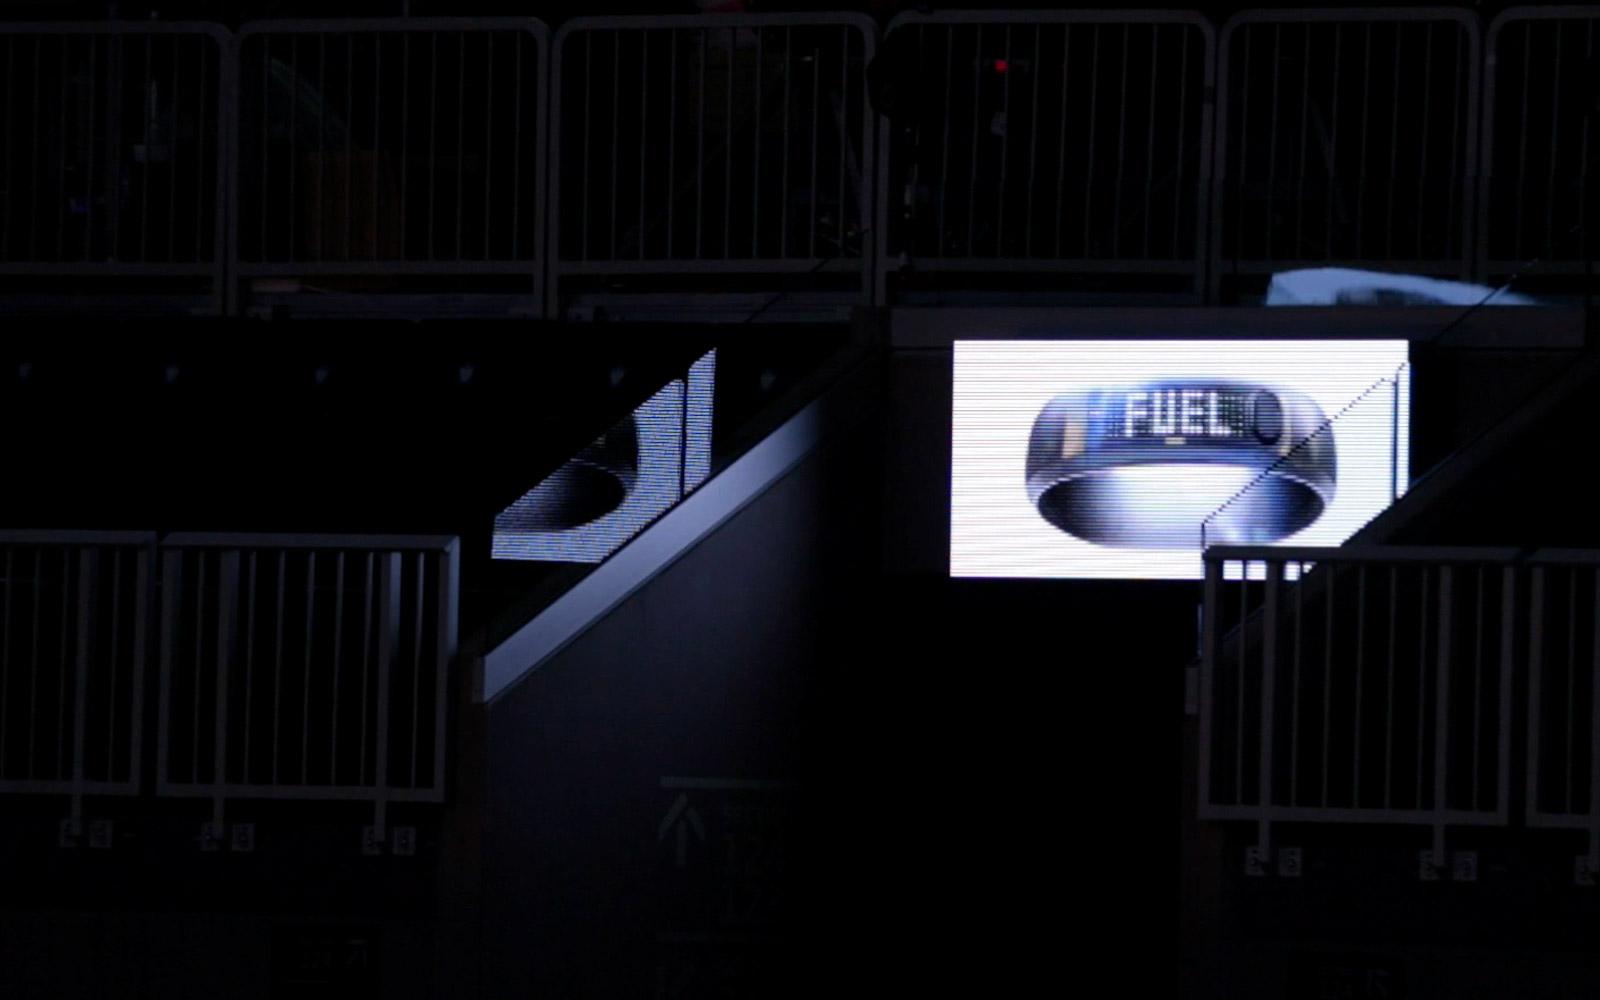 Fuelband_Web6